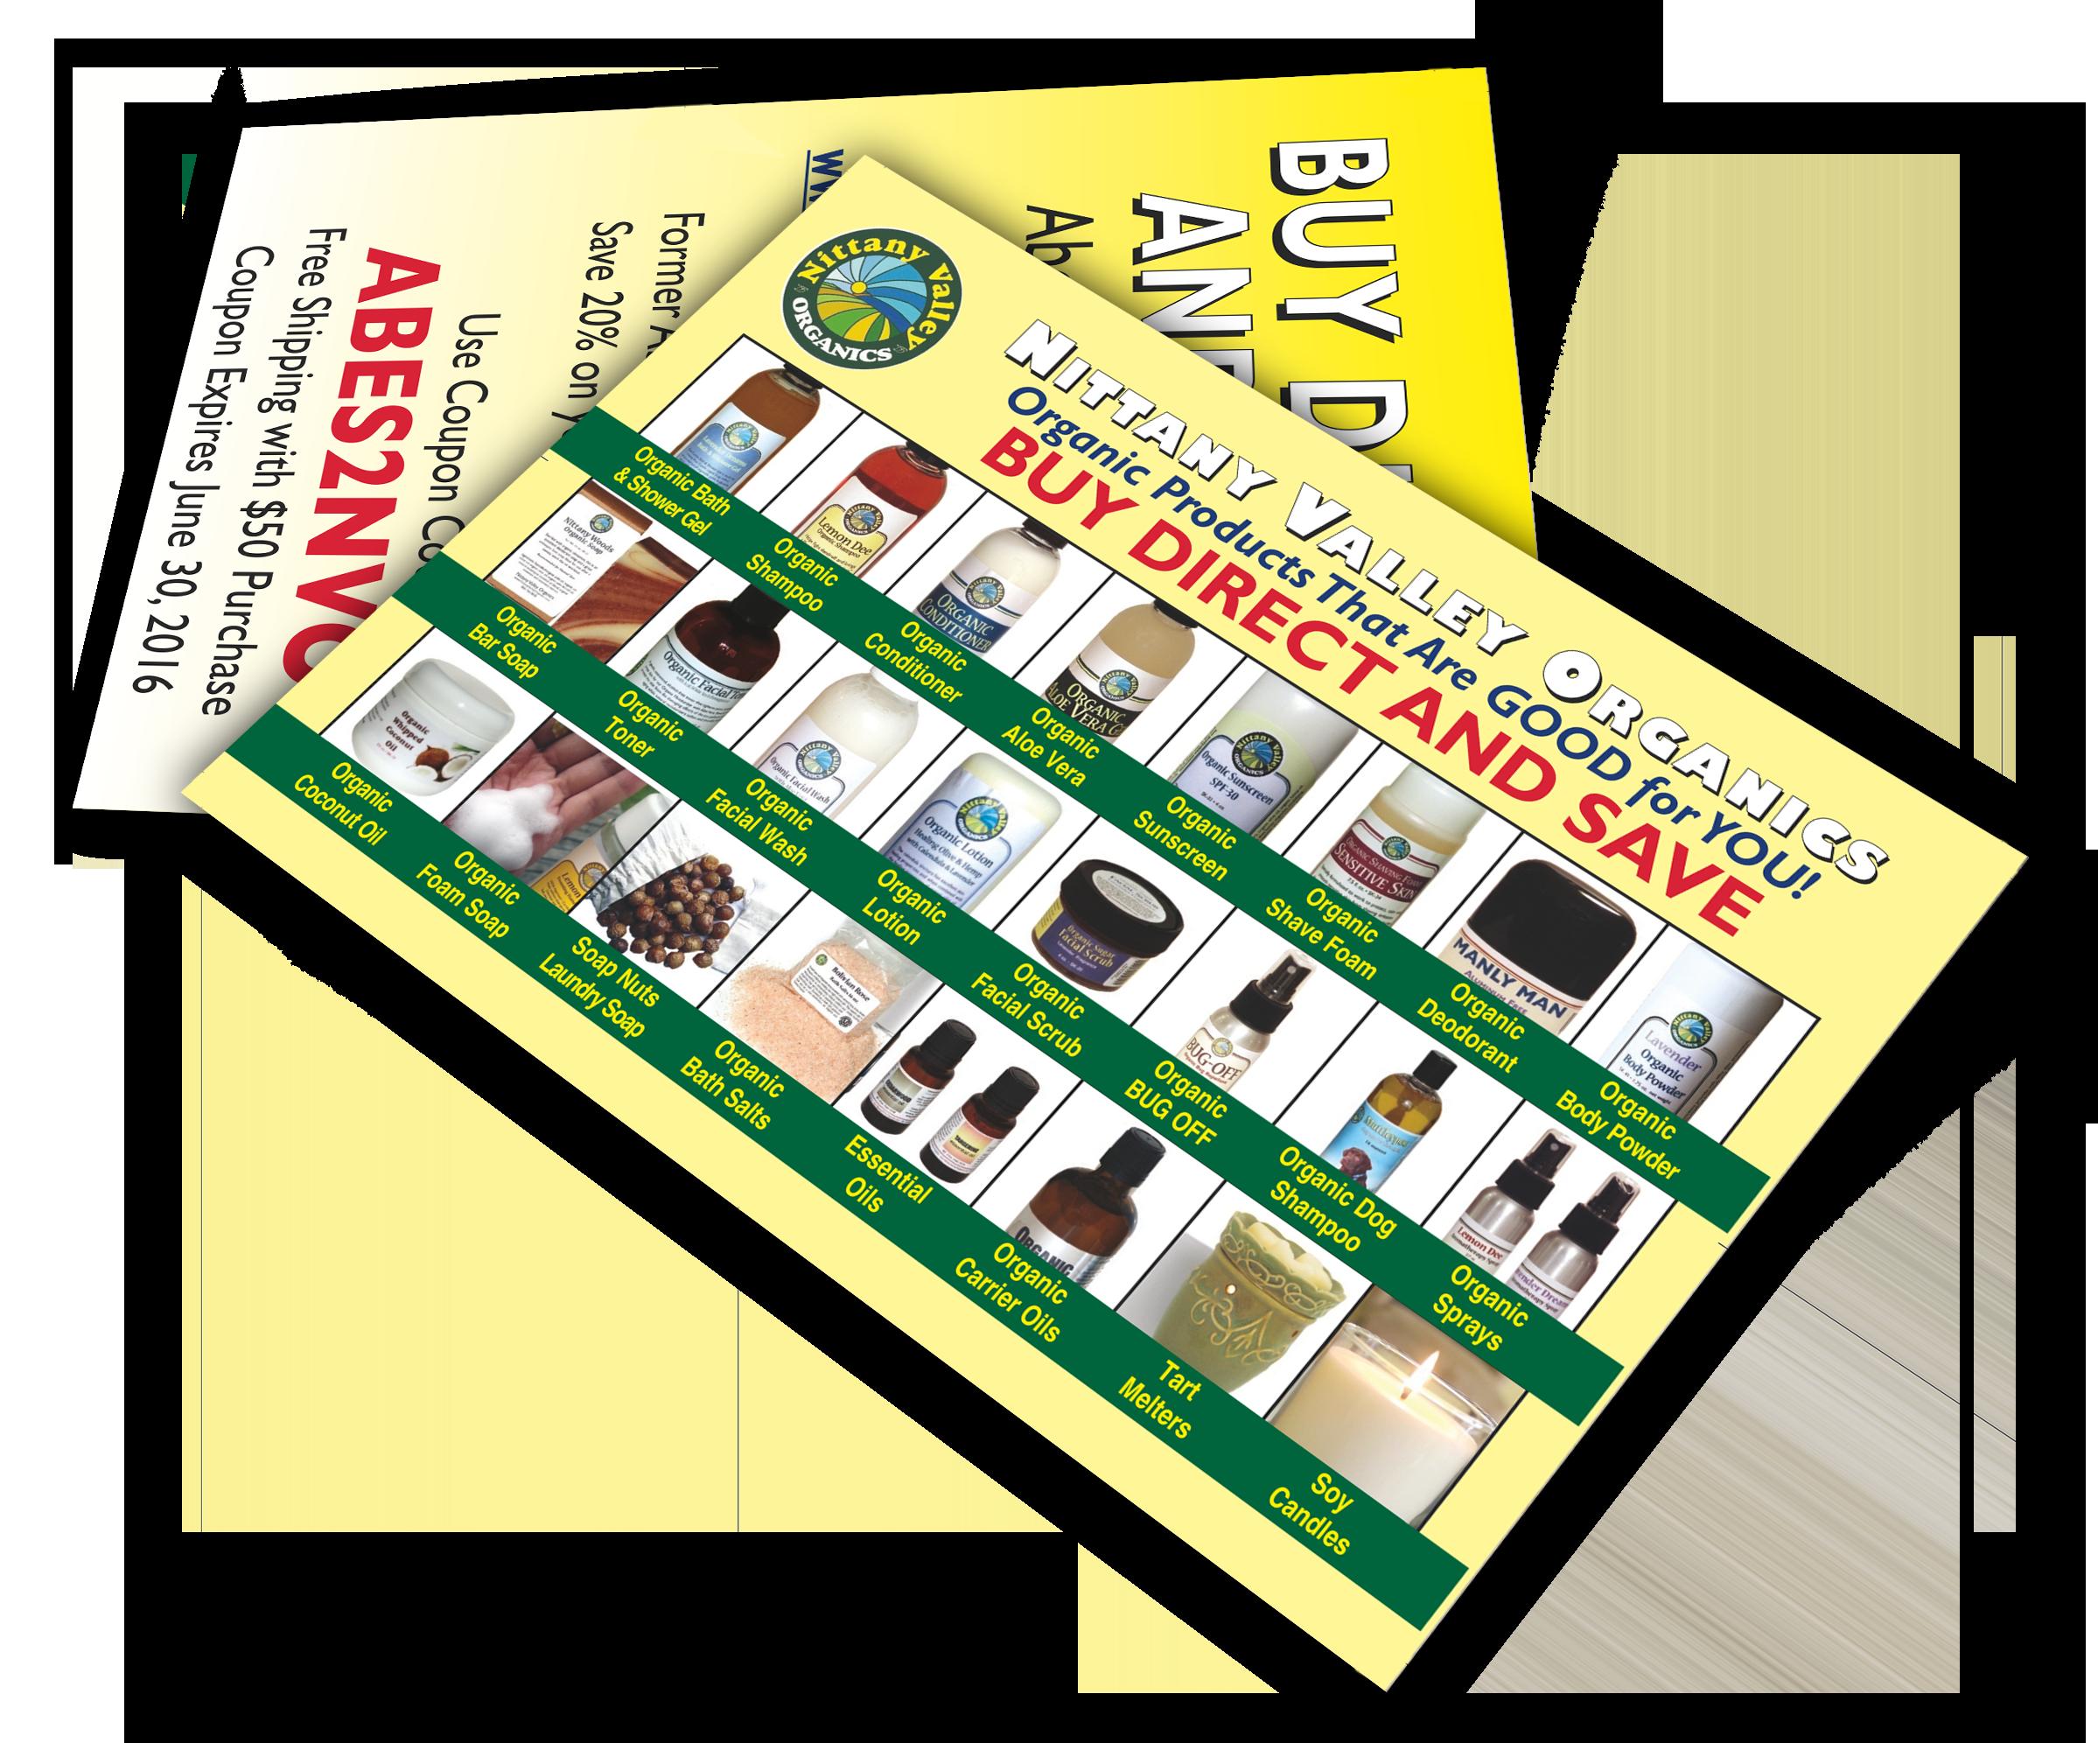 Postcard-Graphic3-500x500 copy.png